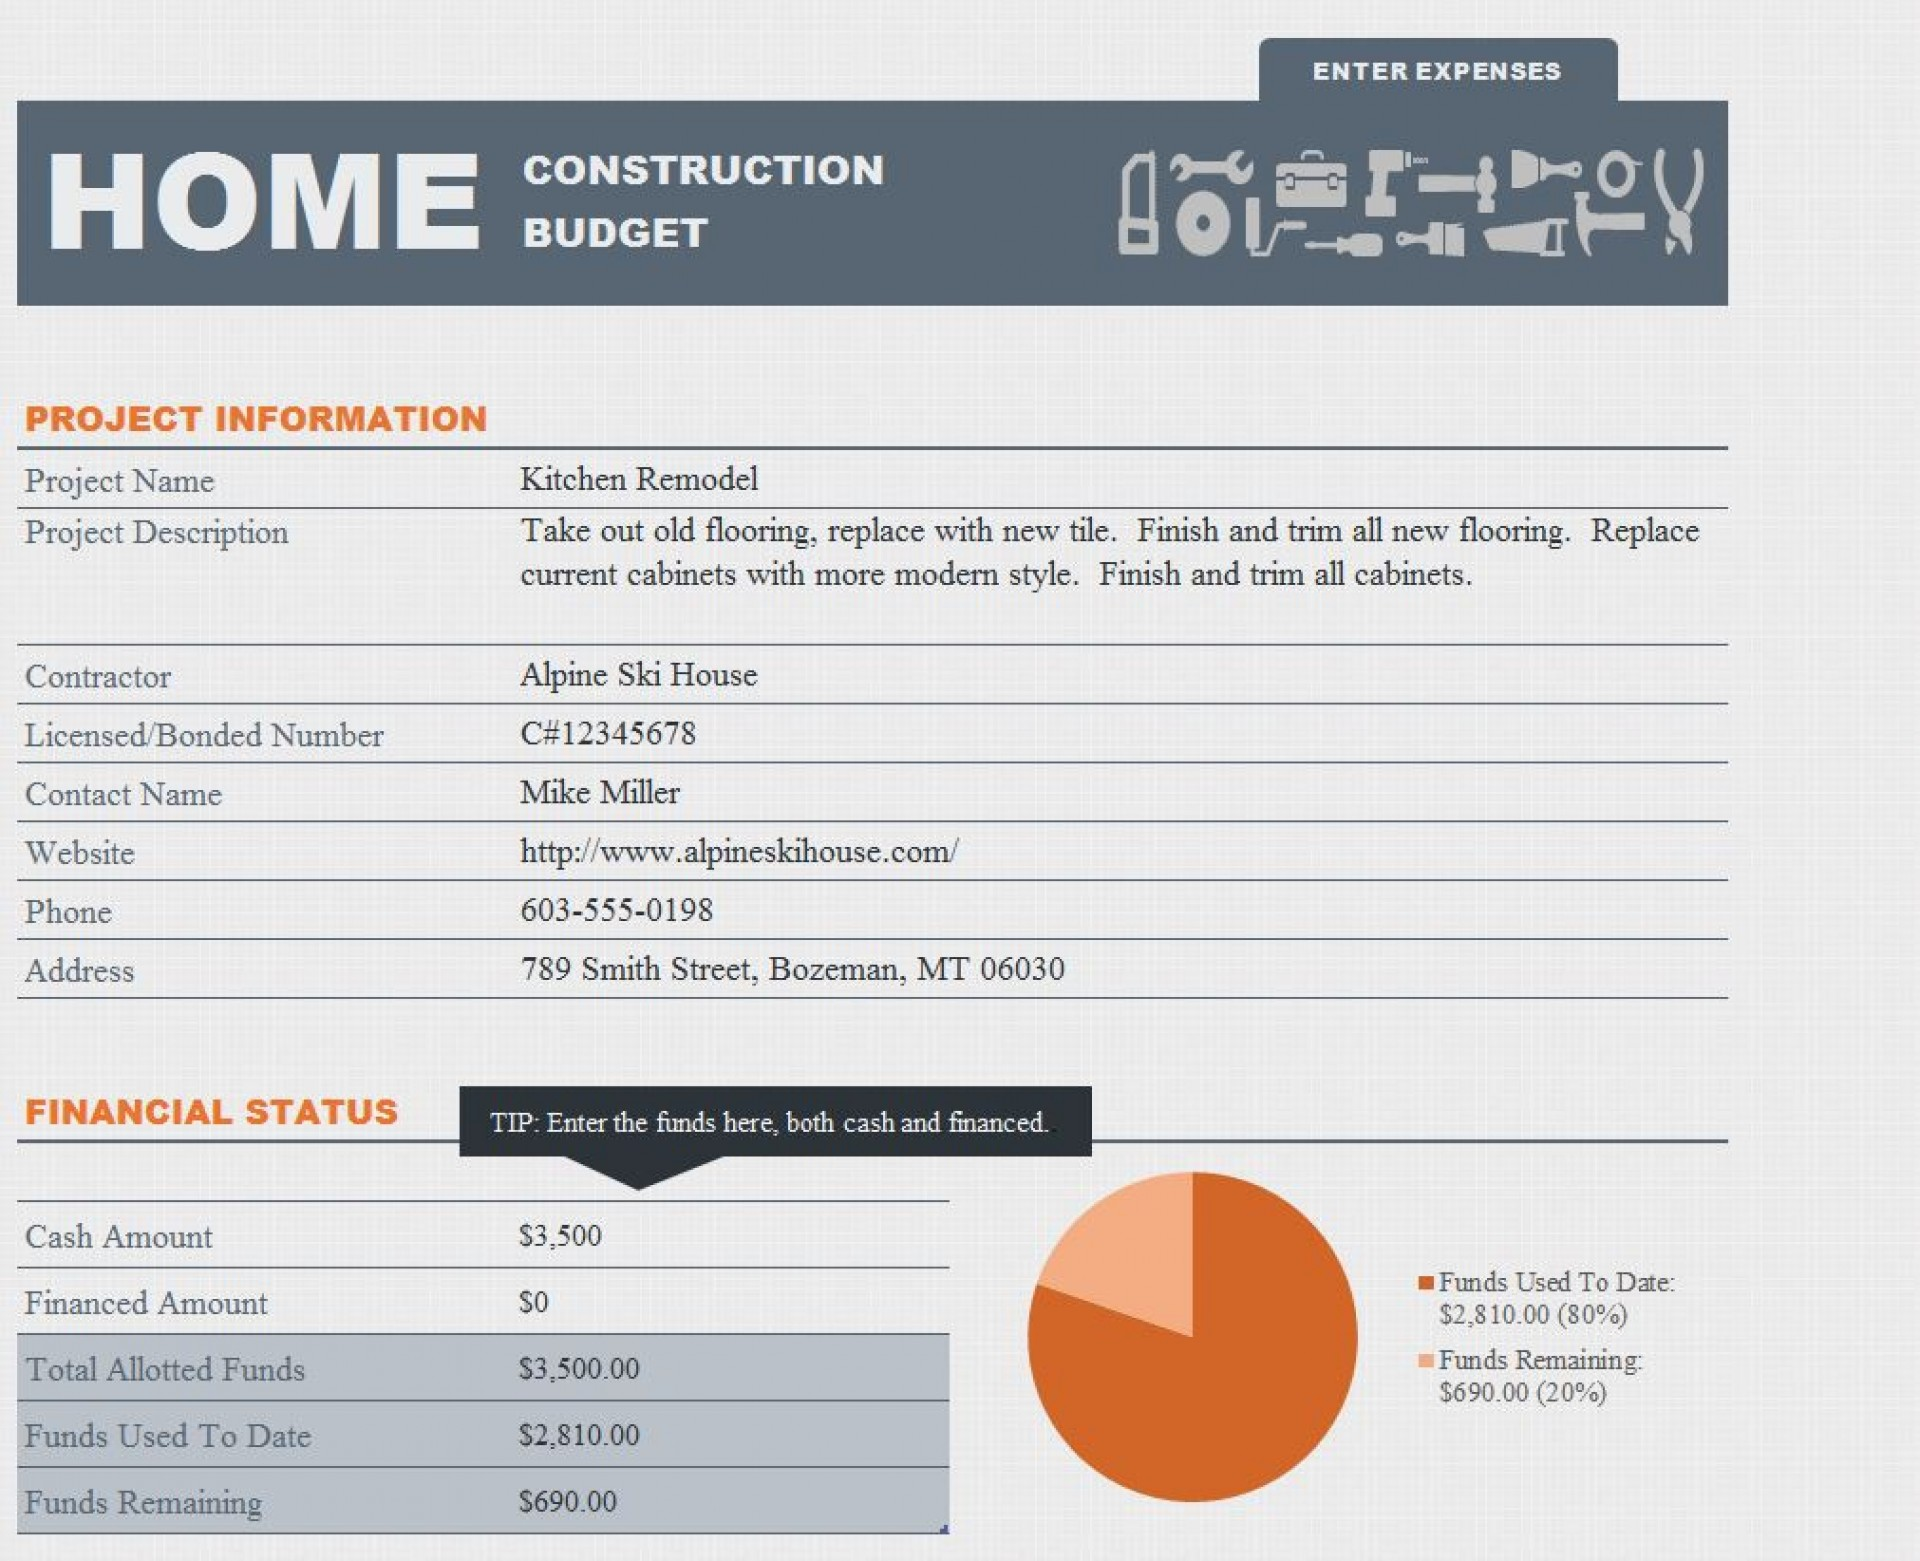 005 Sensational Free Home Remodel Budget Template Example  Renovation Excel Uk Best1920